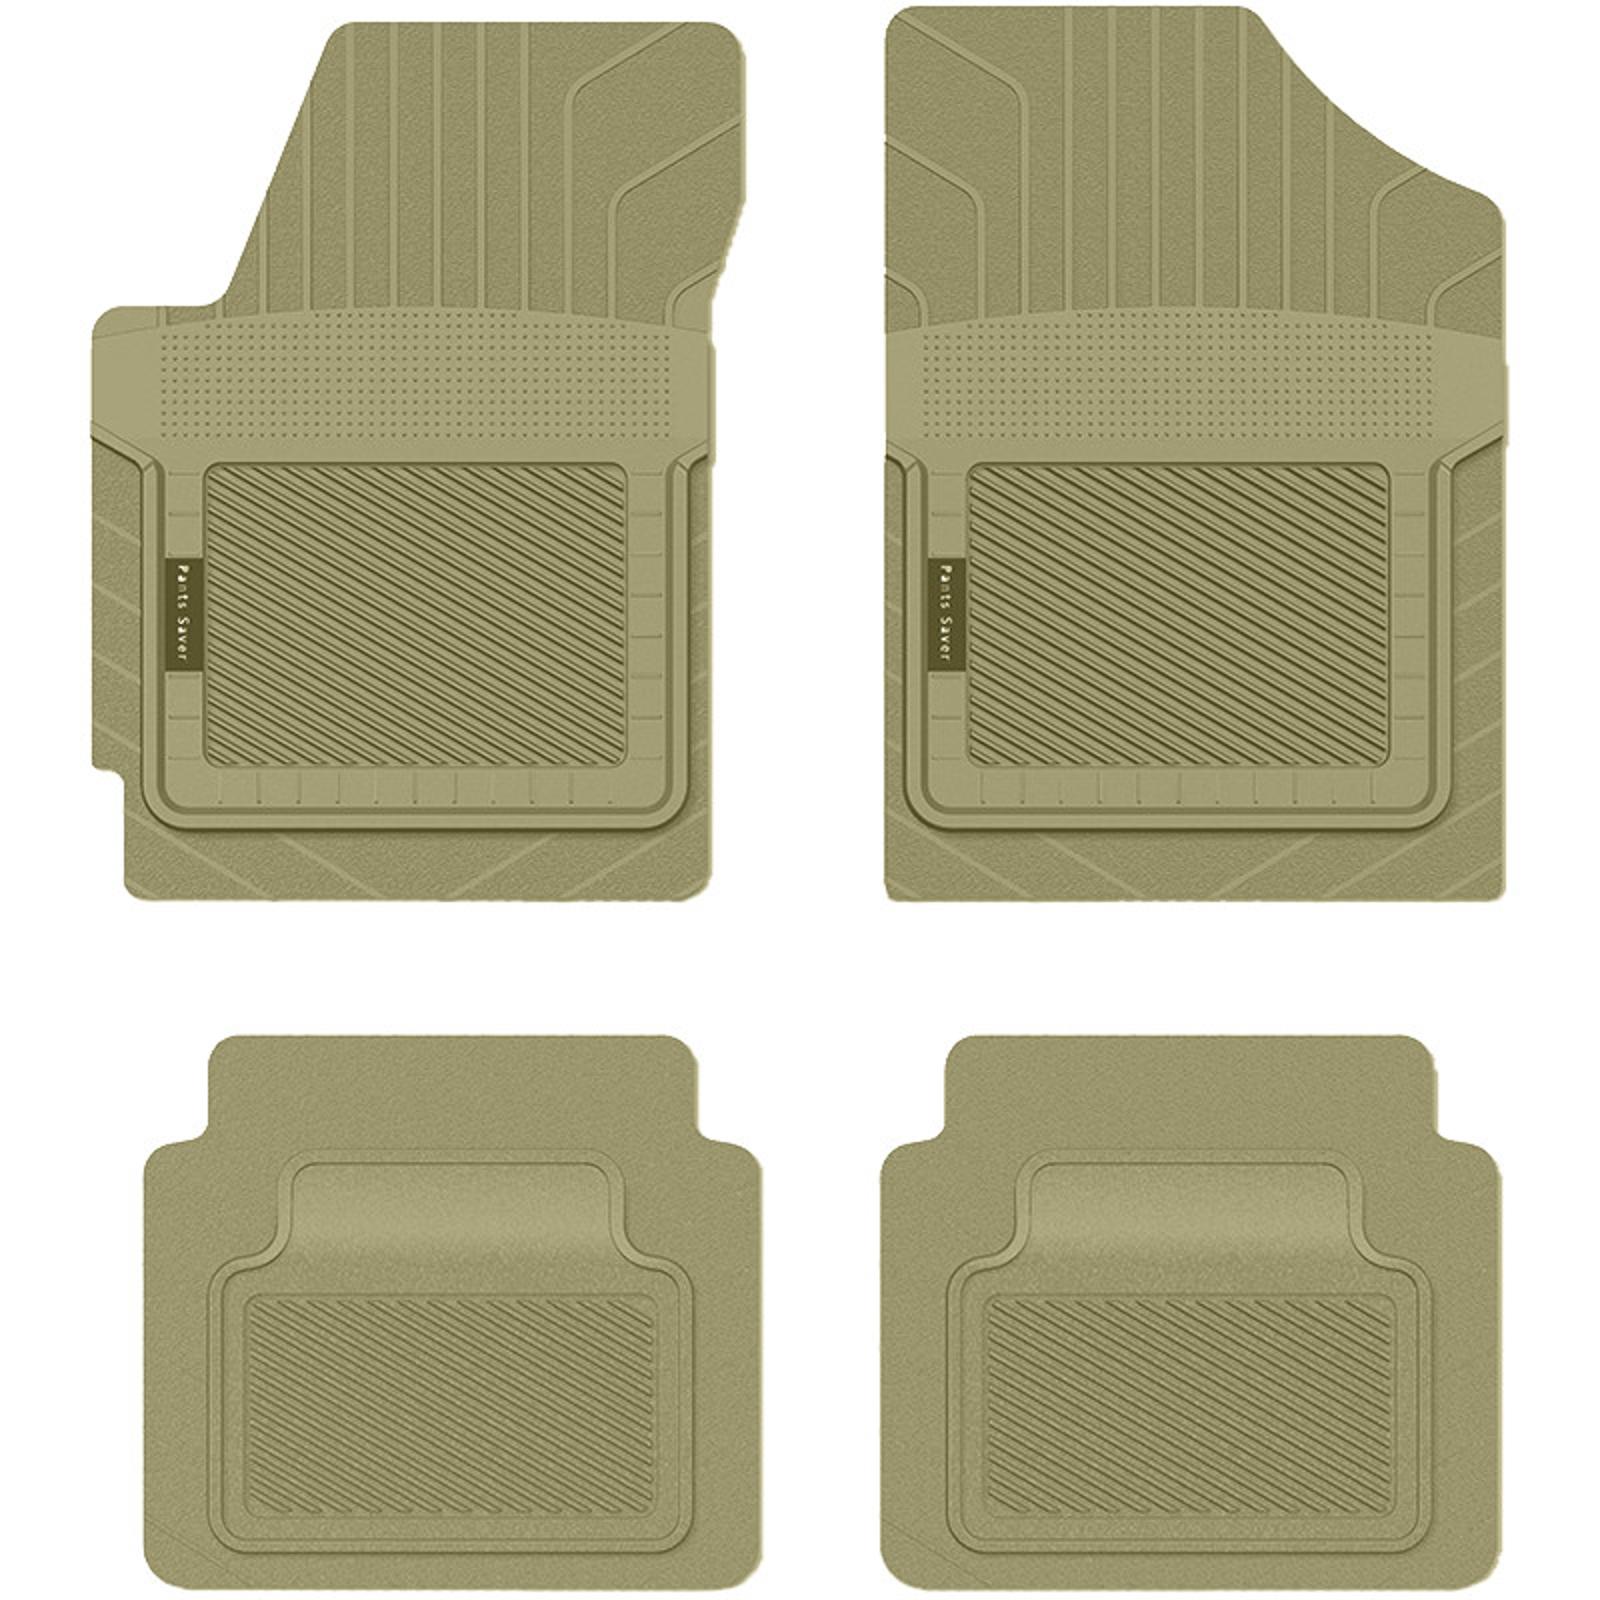 Koolatron Pants Saver Custom Fit Car Mat 4PC GMC Sierra 1500 2017 Black PartNumber: 02802807000P KsnValue: 02802807000 MfgPartNumber: 1109171